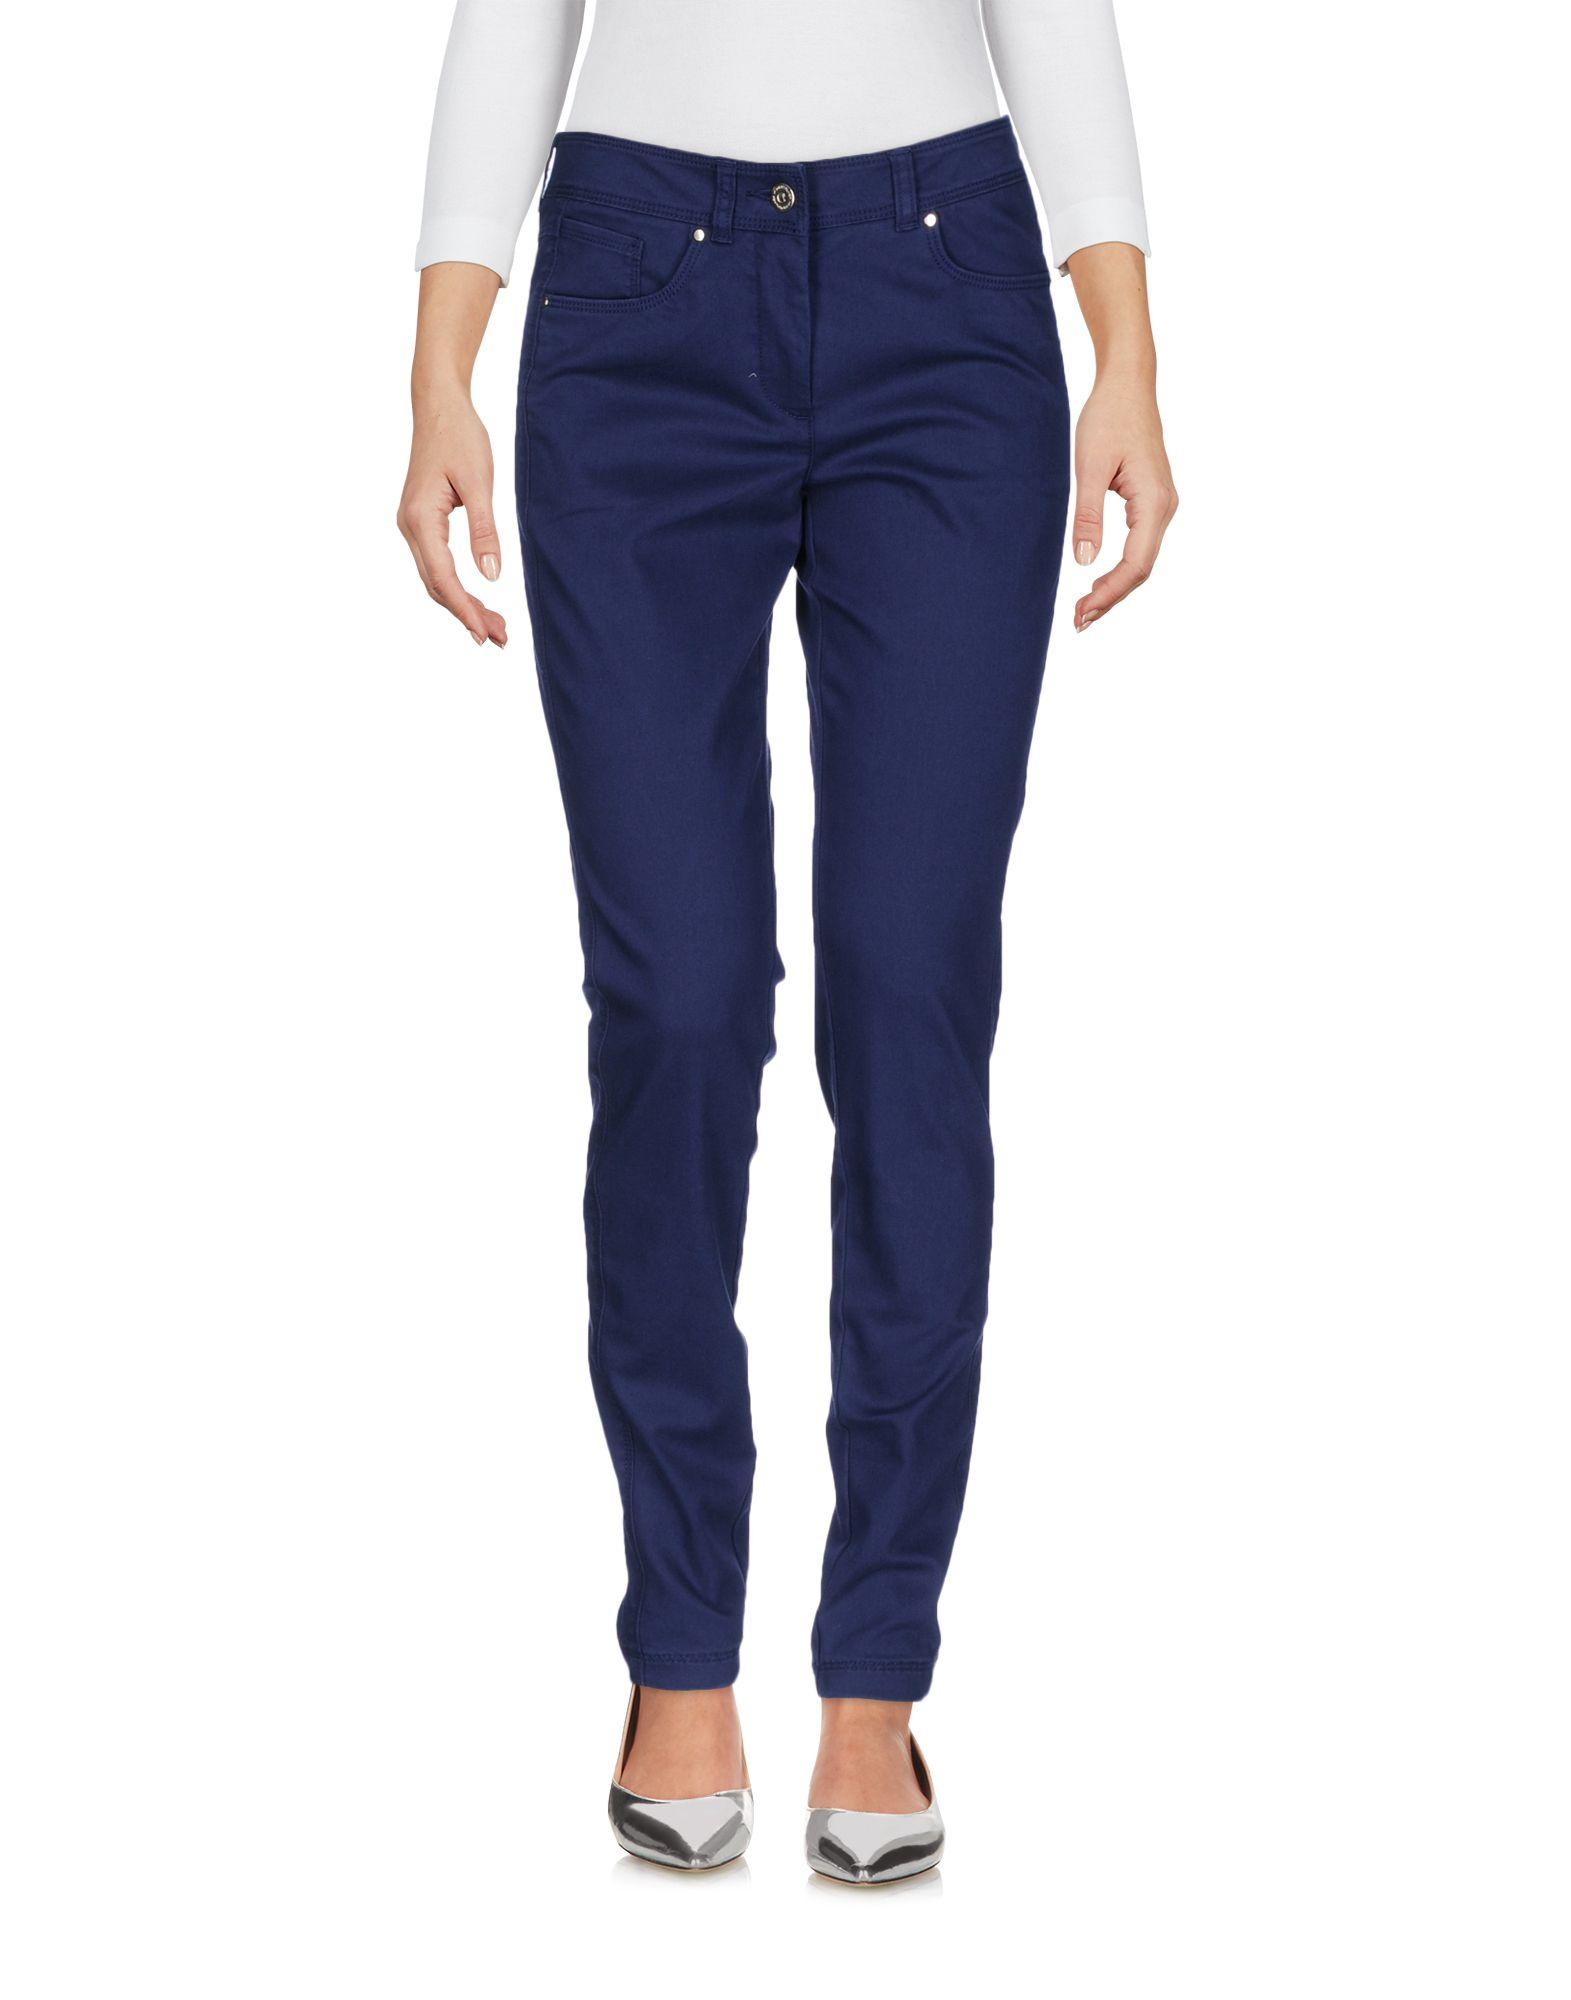 3ad1fc01e6 PENNY - Κορυφαία προϊόντα για ολοκληρωμένα Outfit